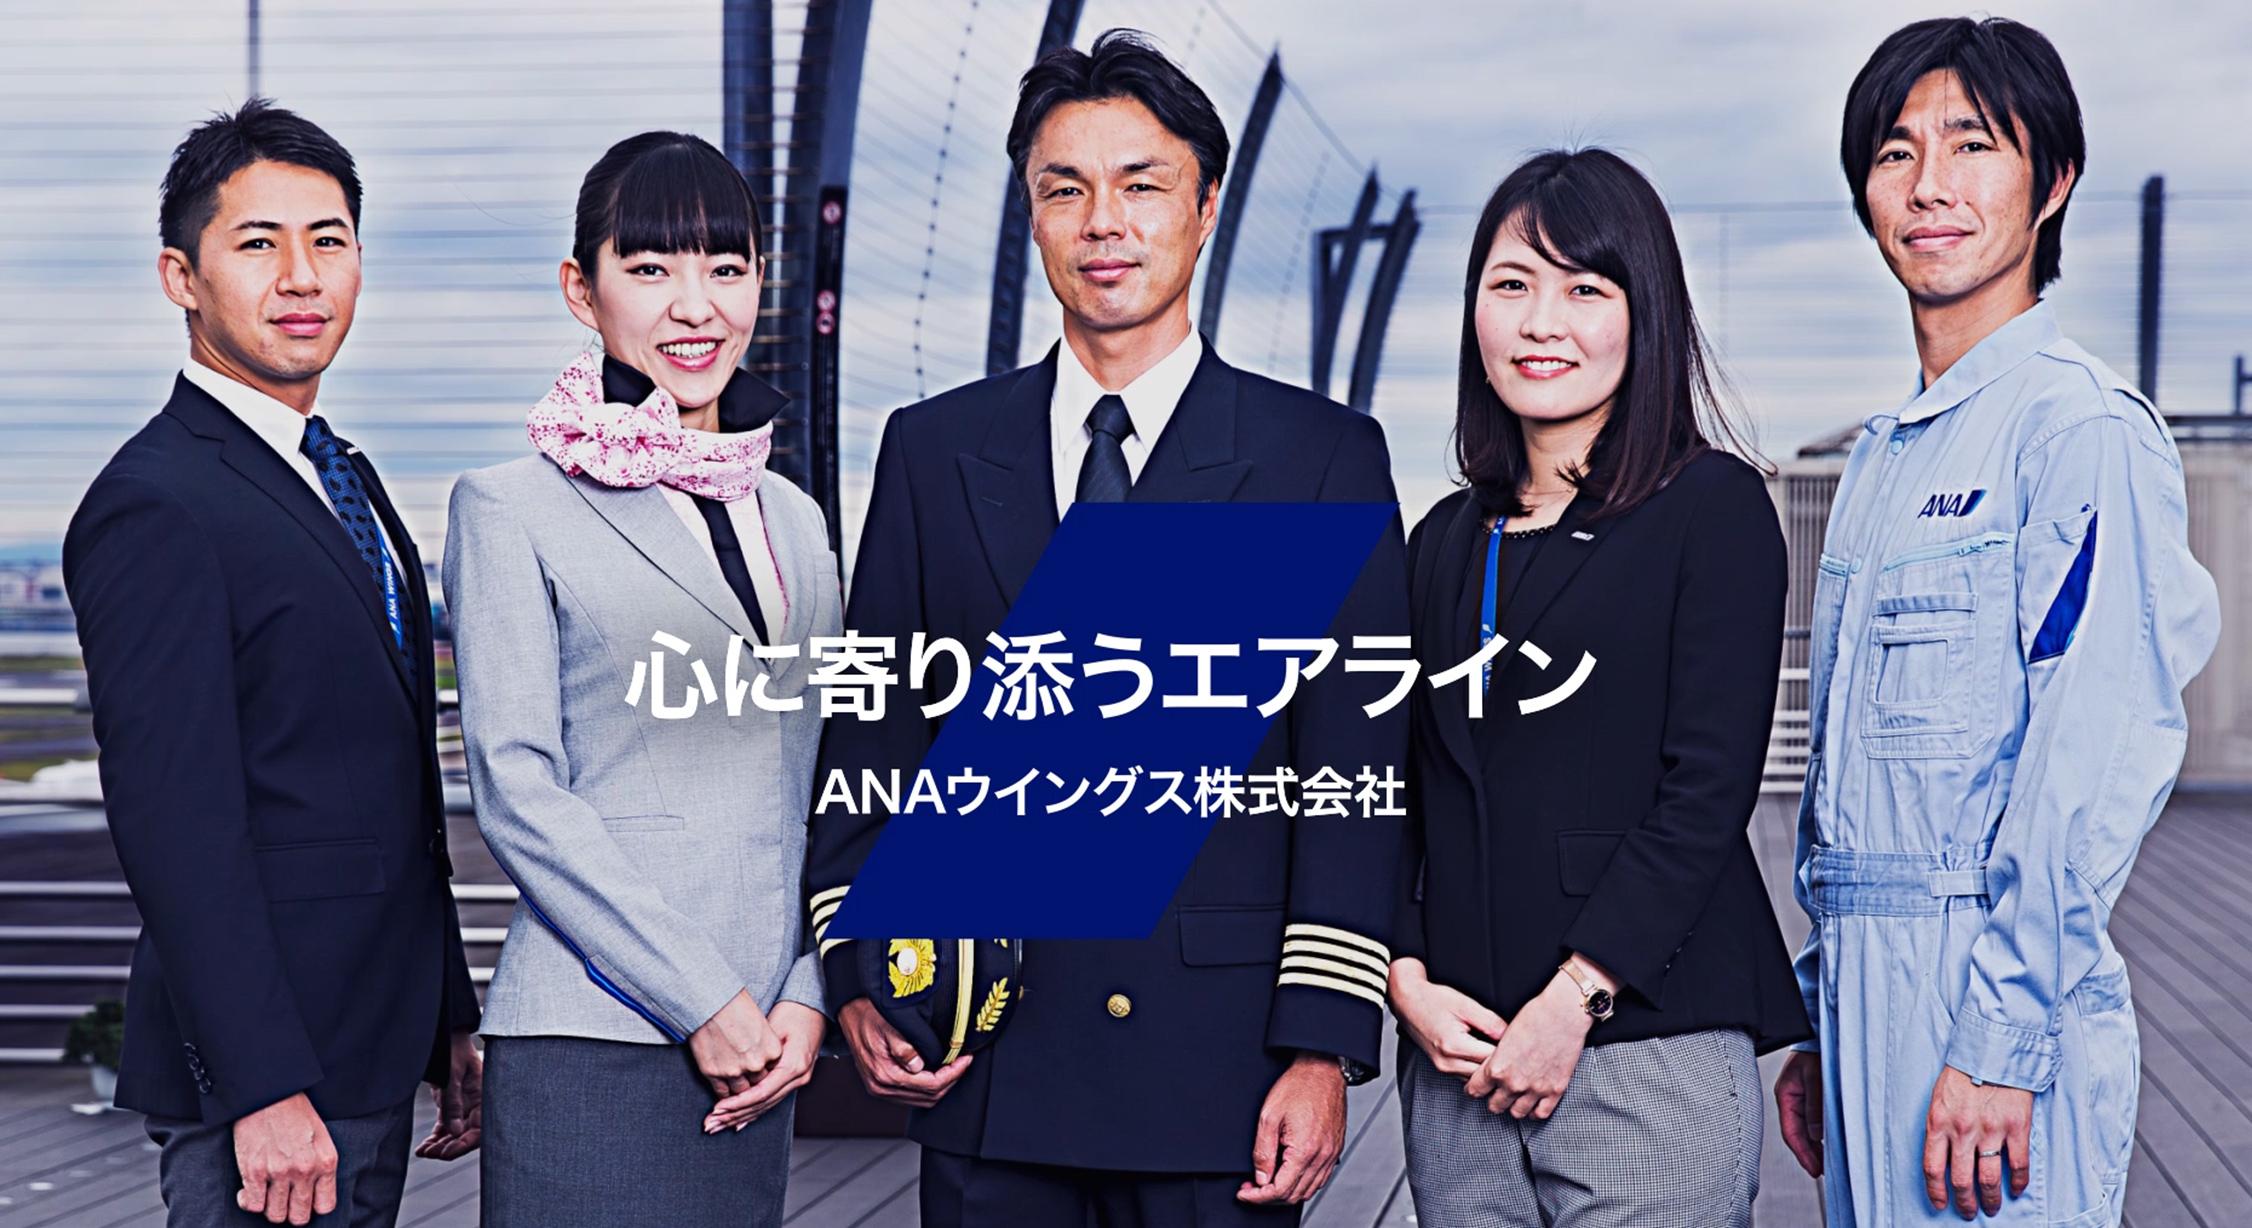 TYME/ANA-Recruit-Image-3